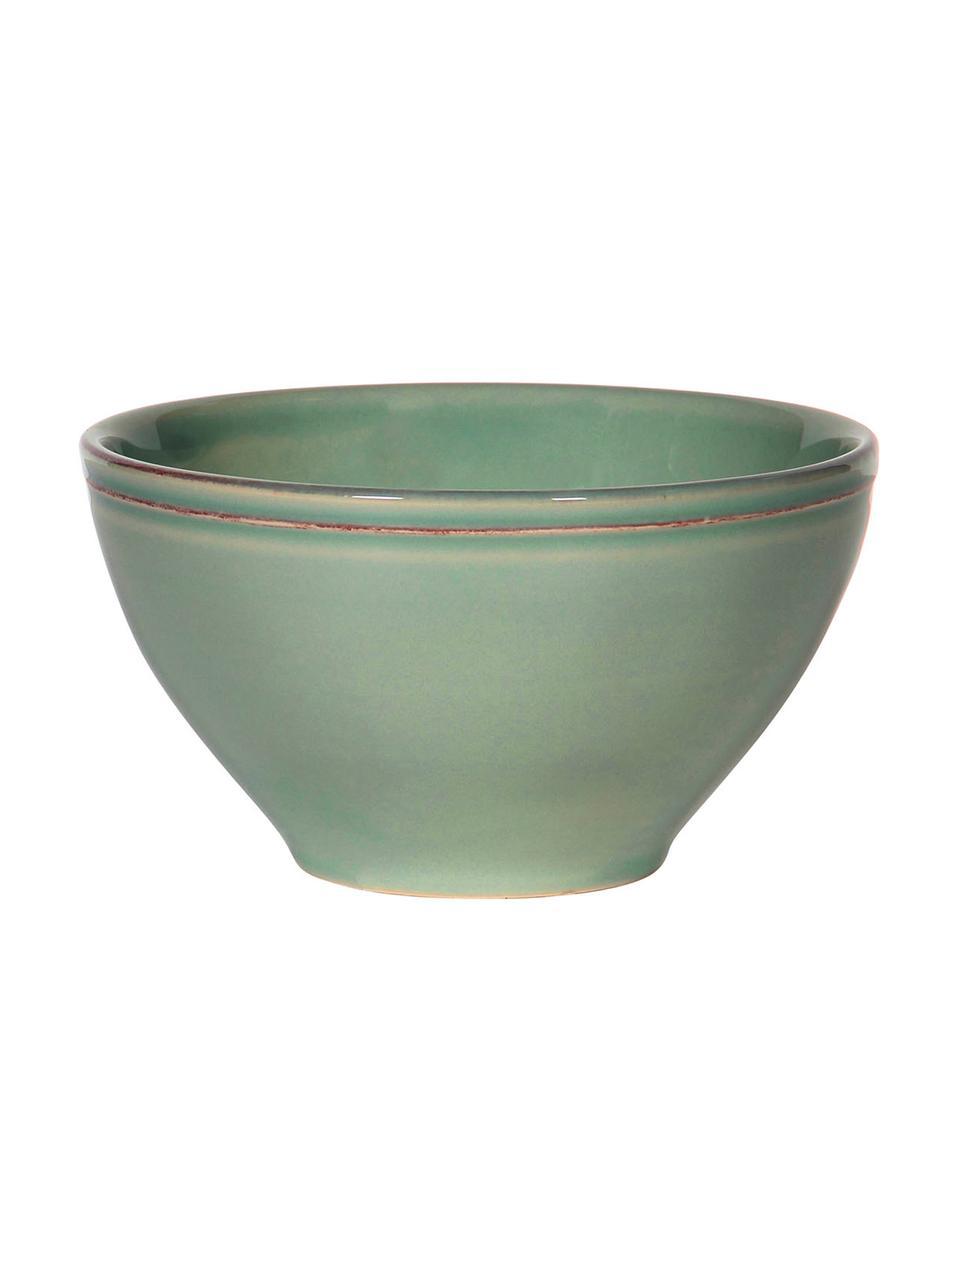 Ciotola verde salvia Constance 2 pz, Terracotta, Verde salvia, Ø 15 x Alt. 9 cm